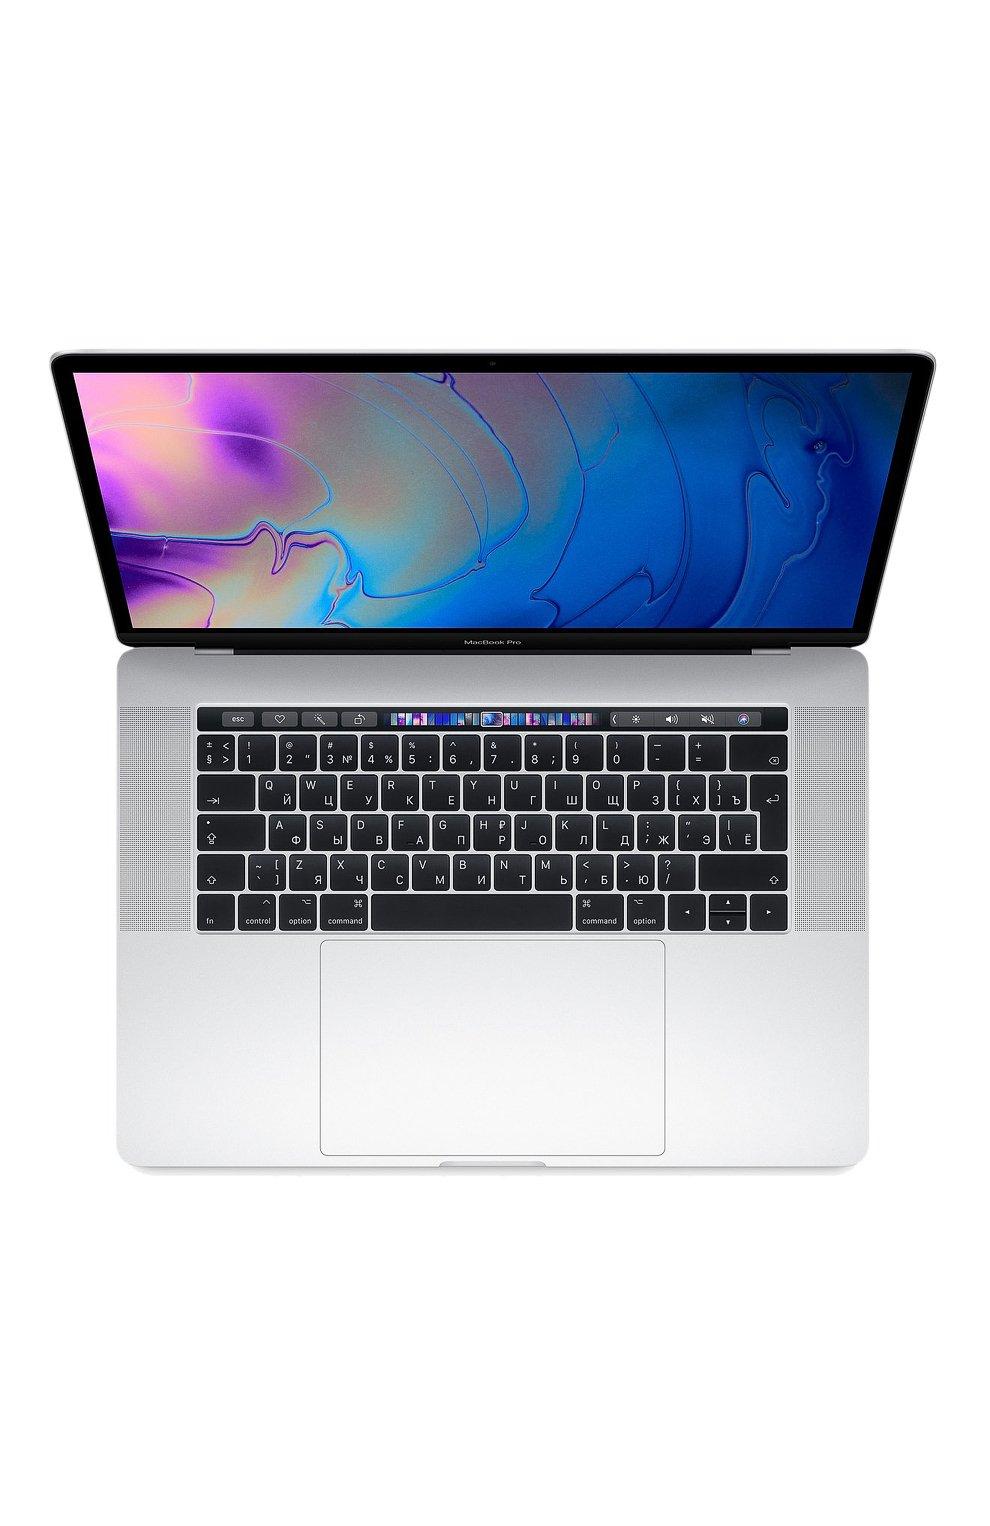 "MacBook Pro 15"" с панелью Touch Bar со встроенным датчиком Touch ID 6-Core i7 2.6GHz 512GB Silver Apple    Фото №1"